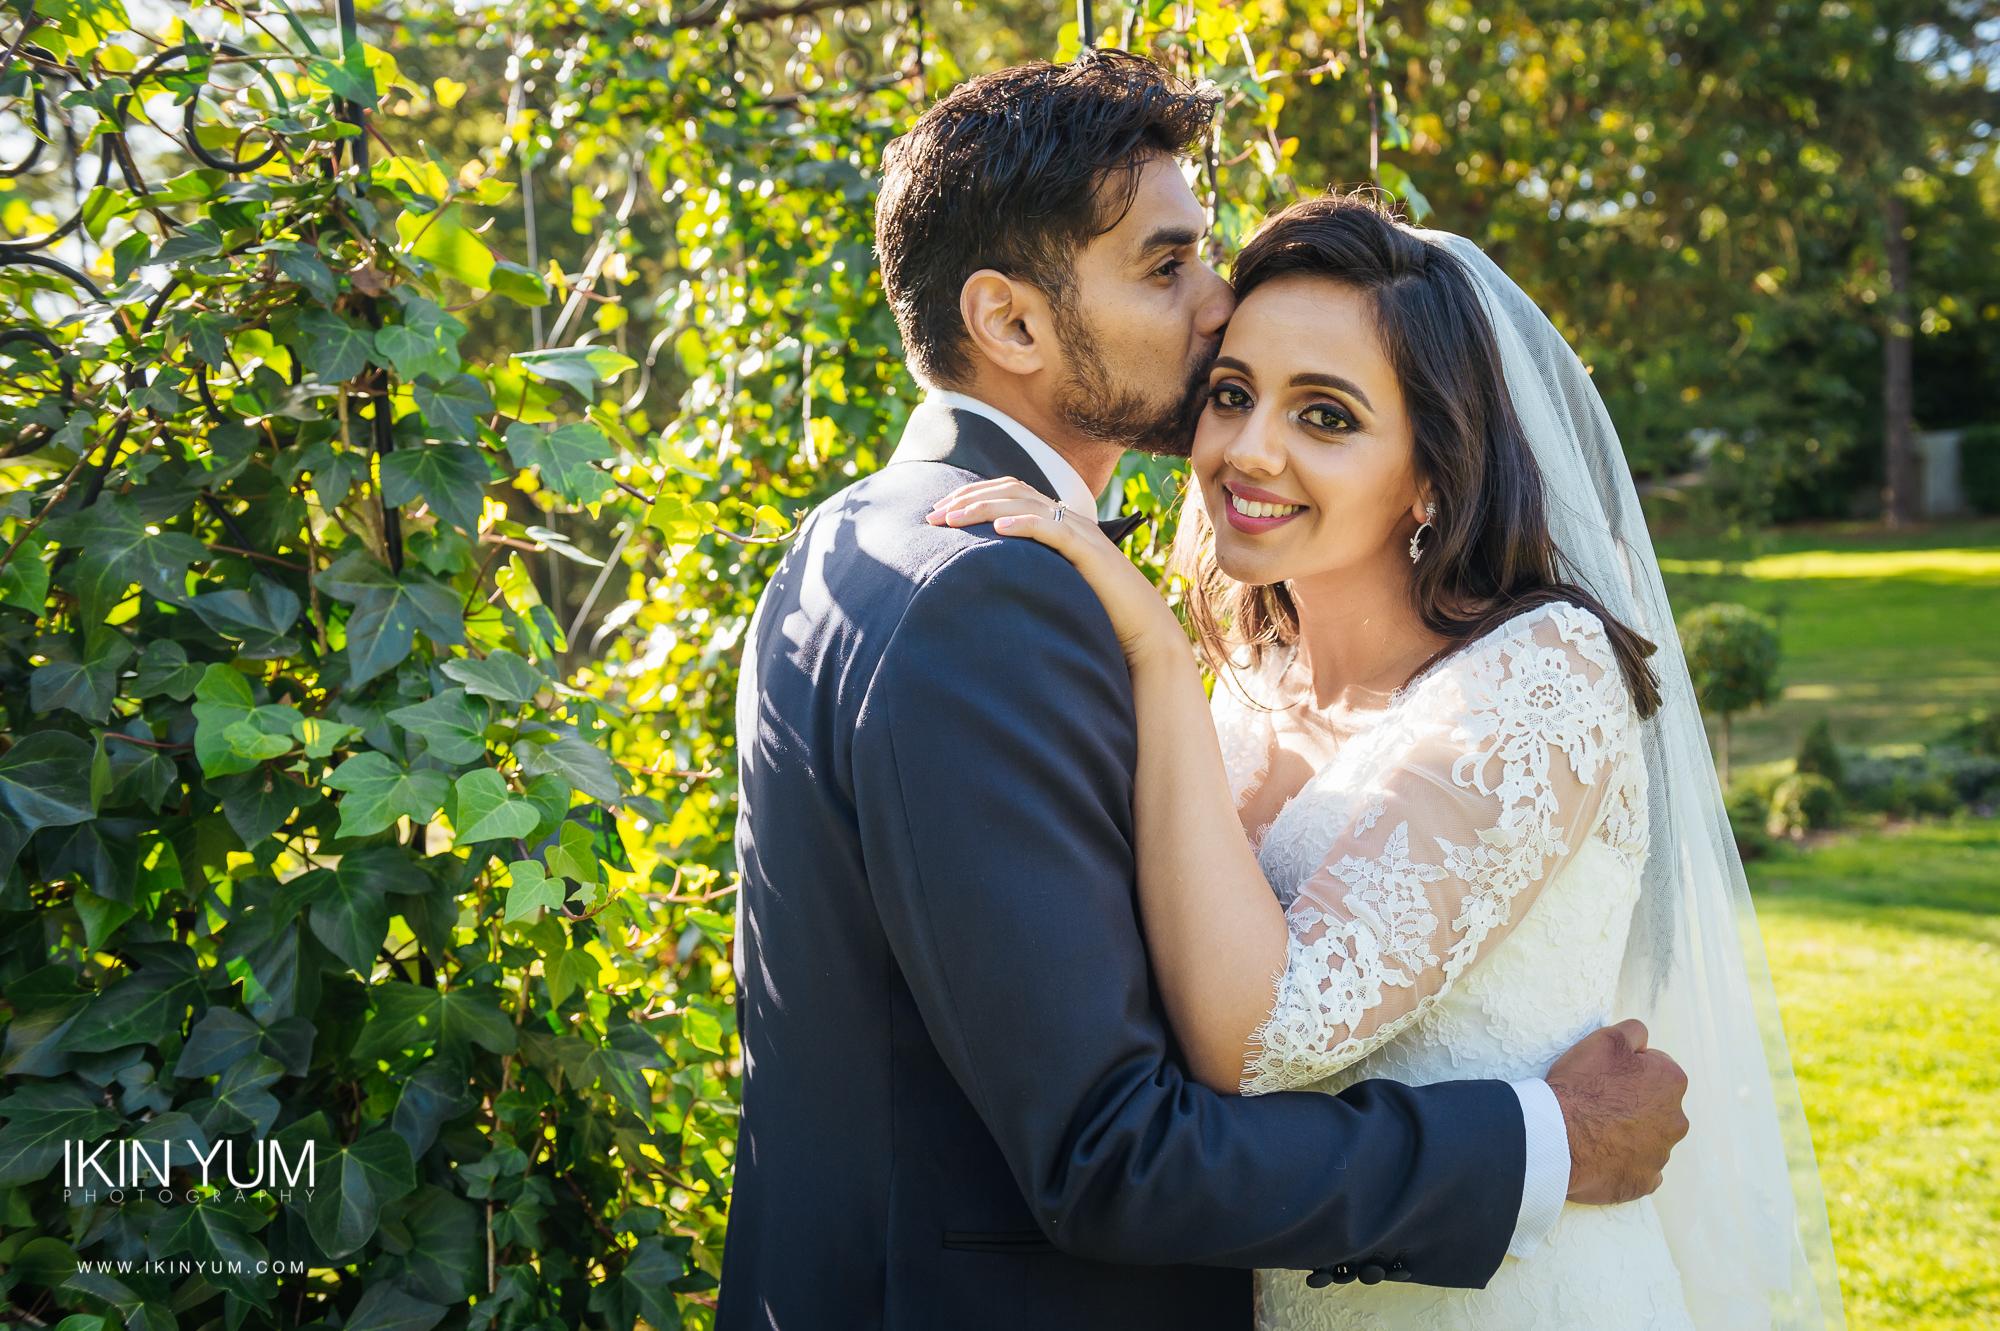 Laura Ashley Manor Wedding - Ikin Yum Photography-098.jpg